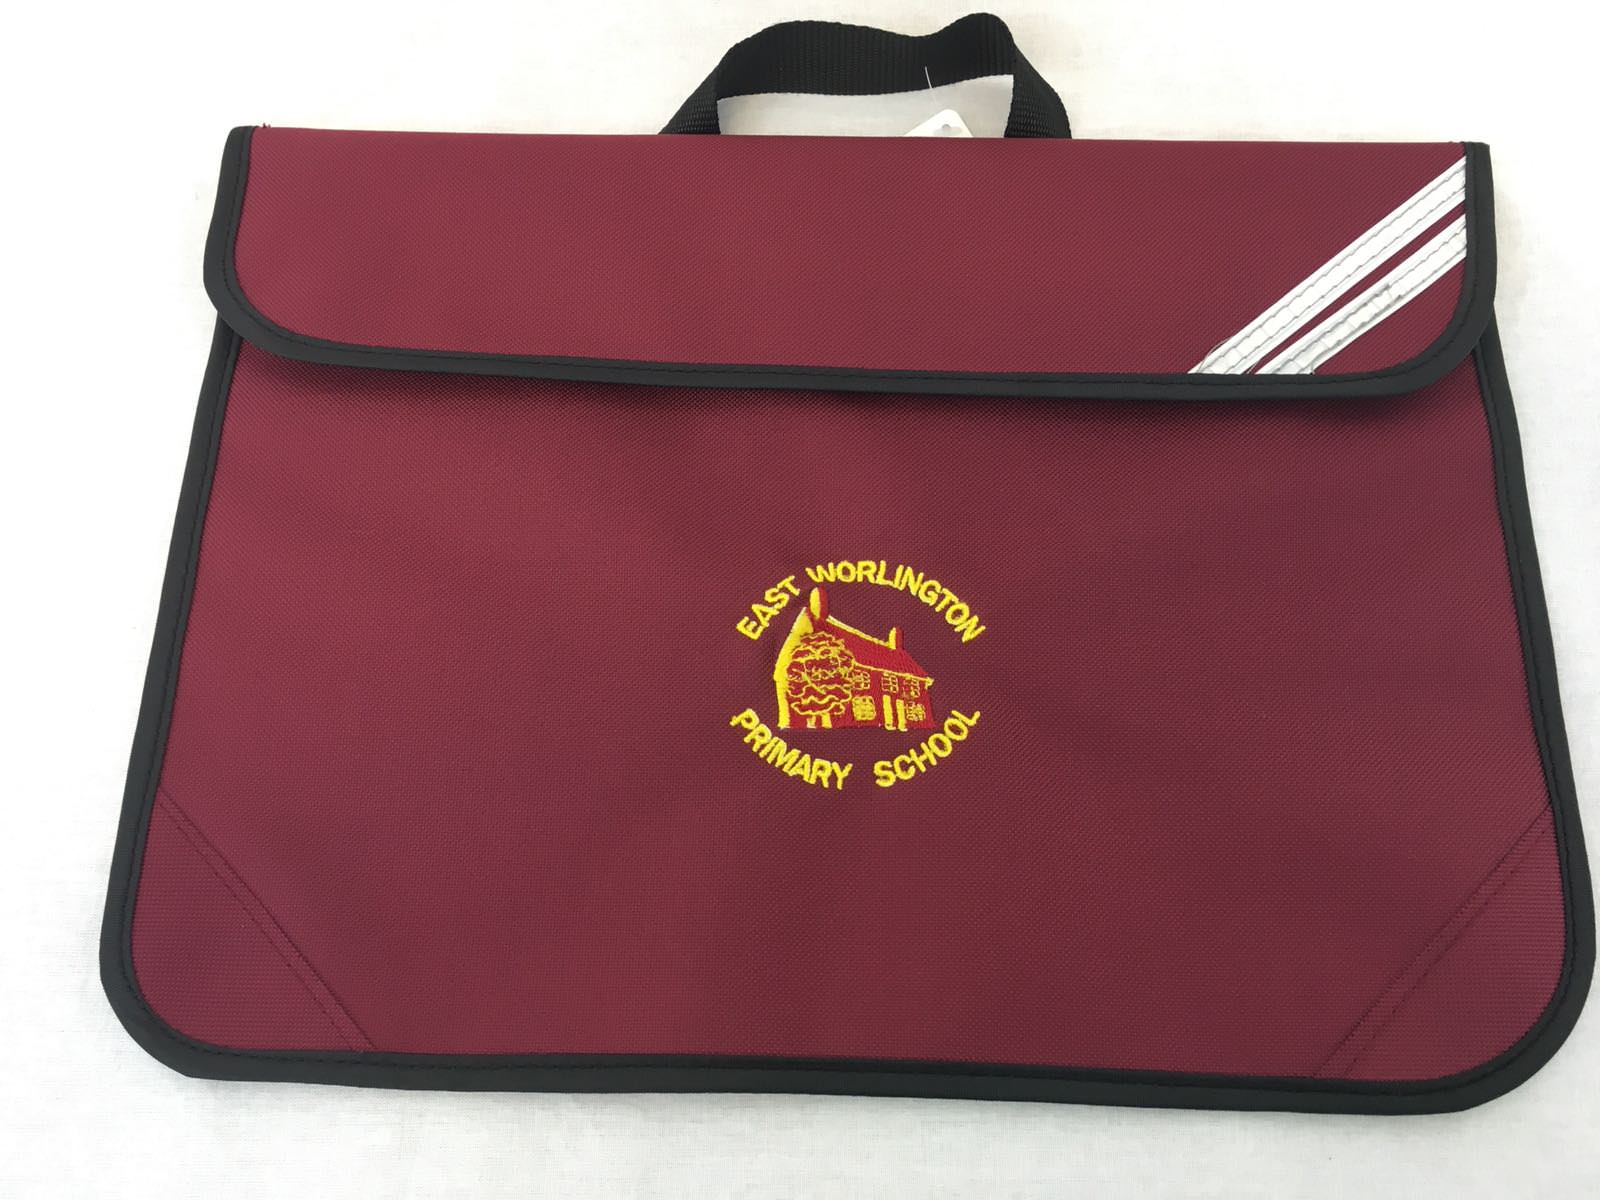 East Worlington Primary School Book Bag 1acb96f140e23